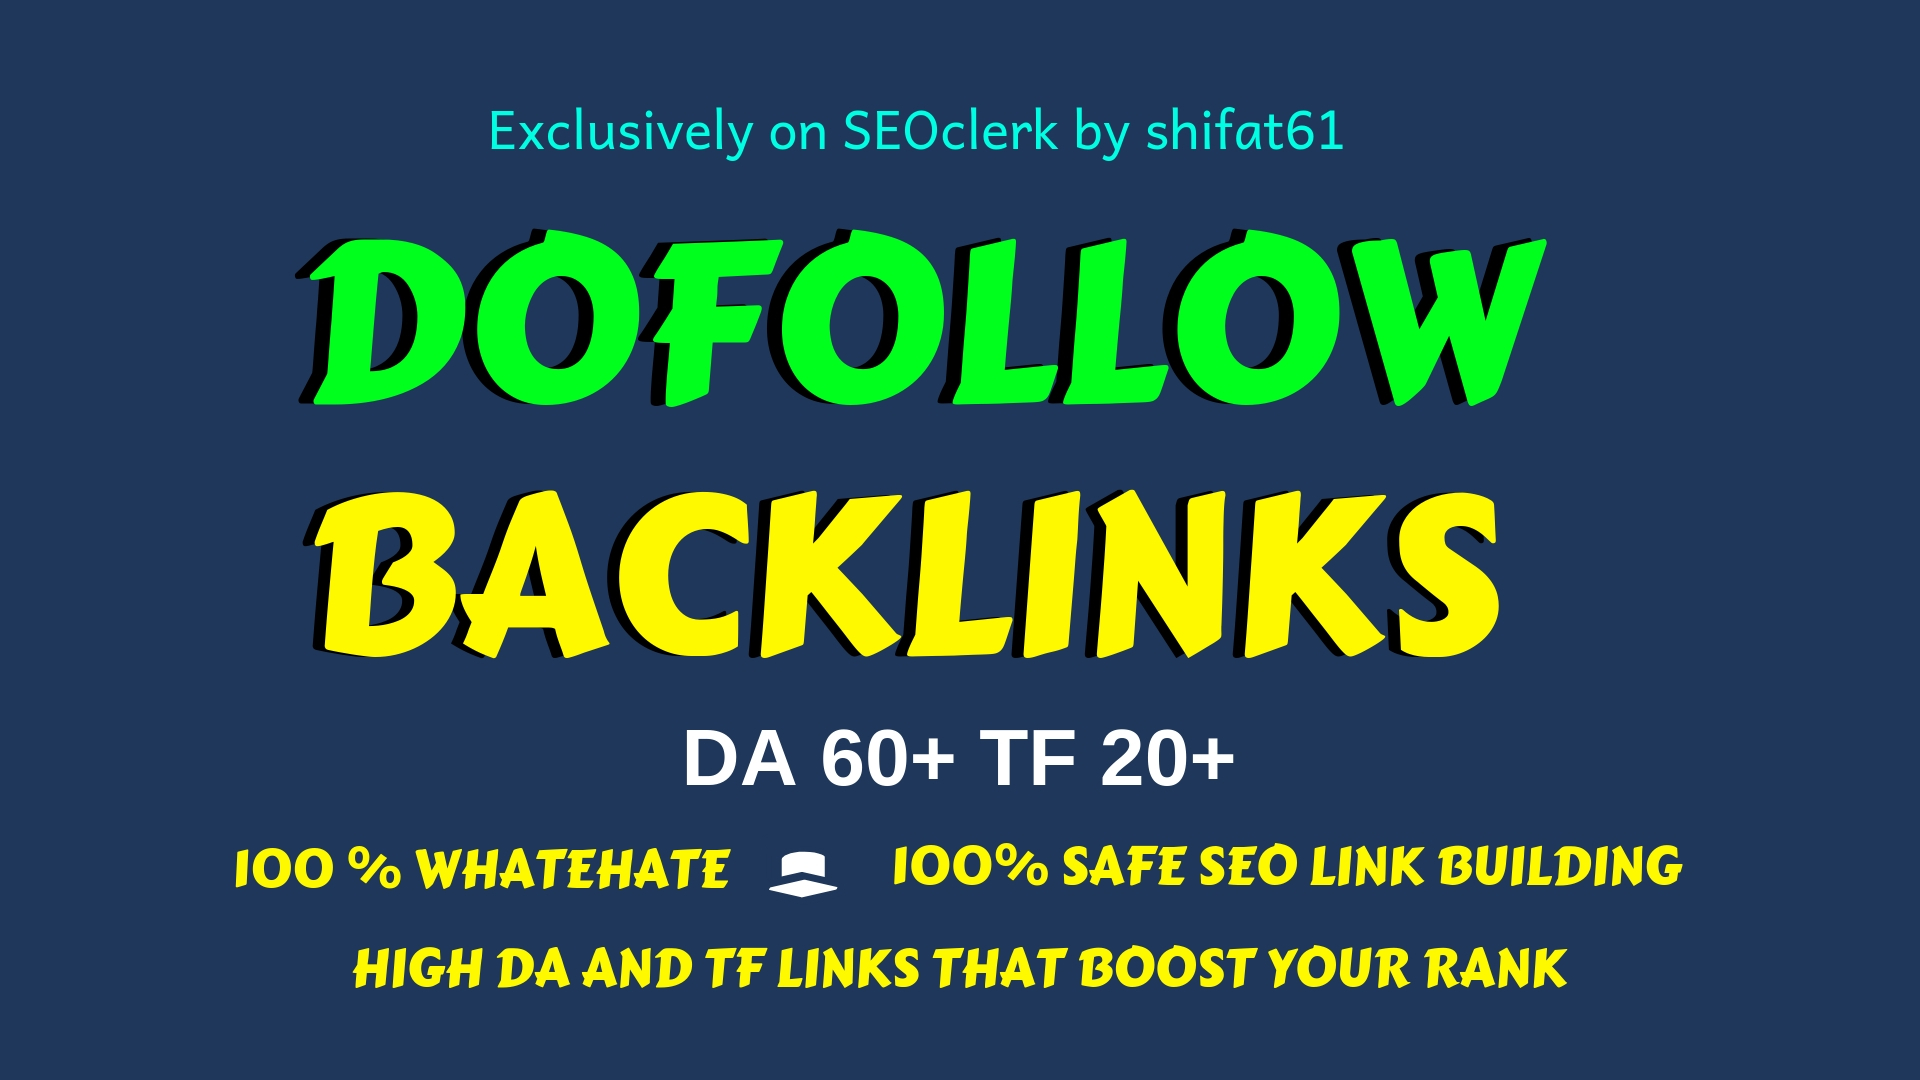 55 Dofollow SEO Backlinks, Boost Your Google Ranking